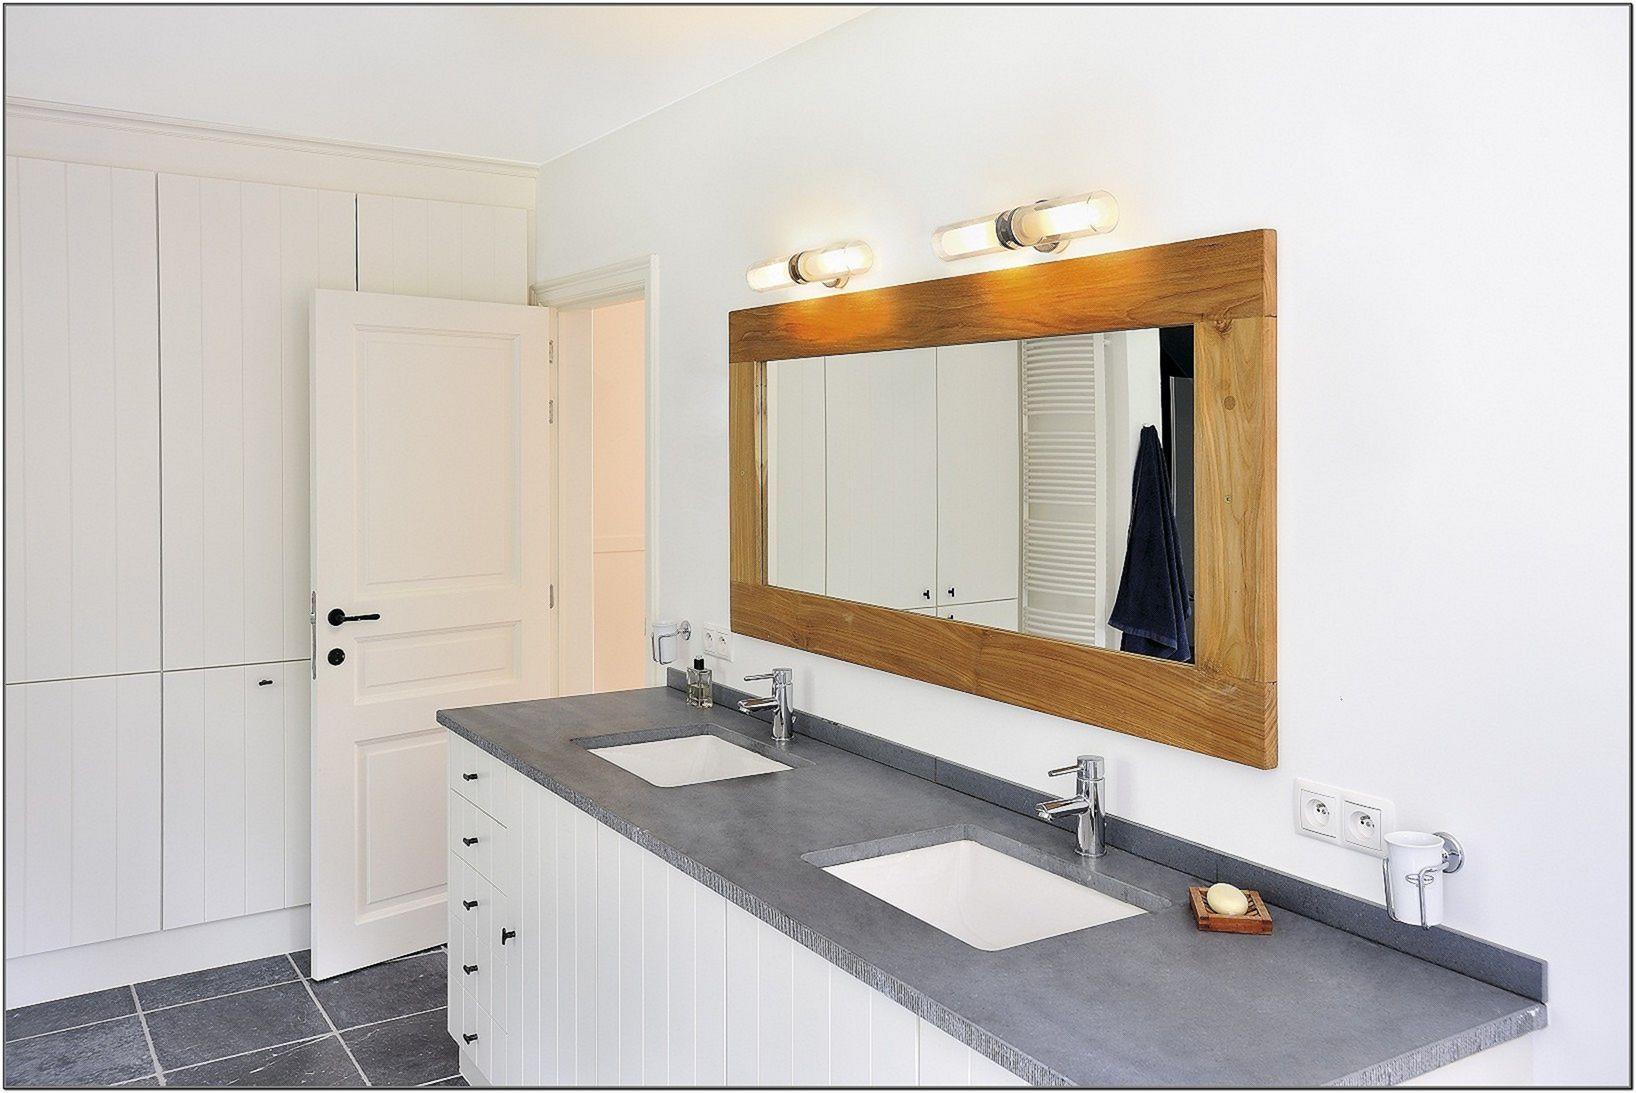 10 Impressive Bathroom Accessories You Need To Copy Bathroom Mirror Design Bathroom Light Fixtures Modern Bathroom Design